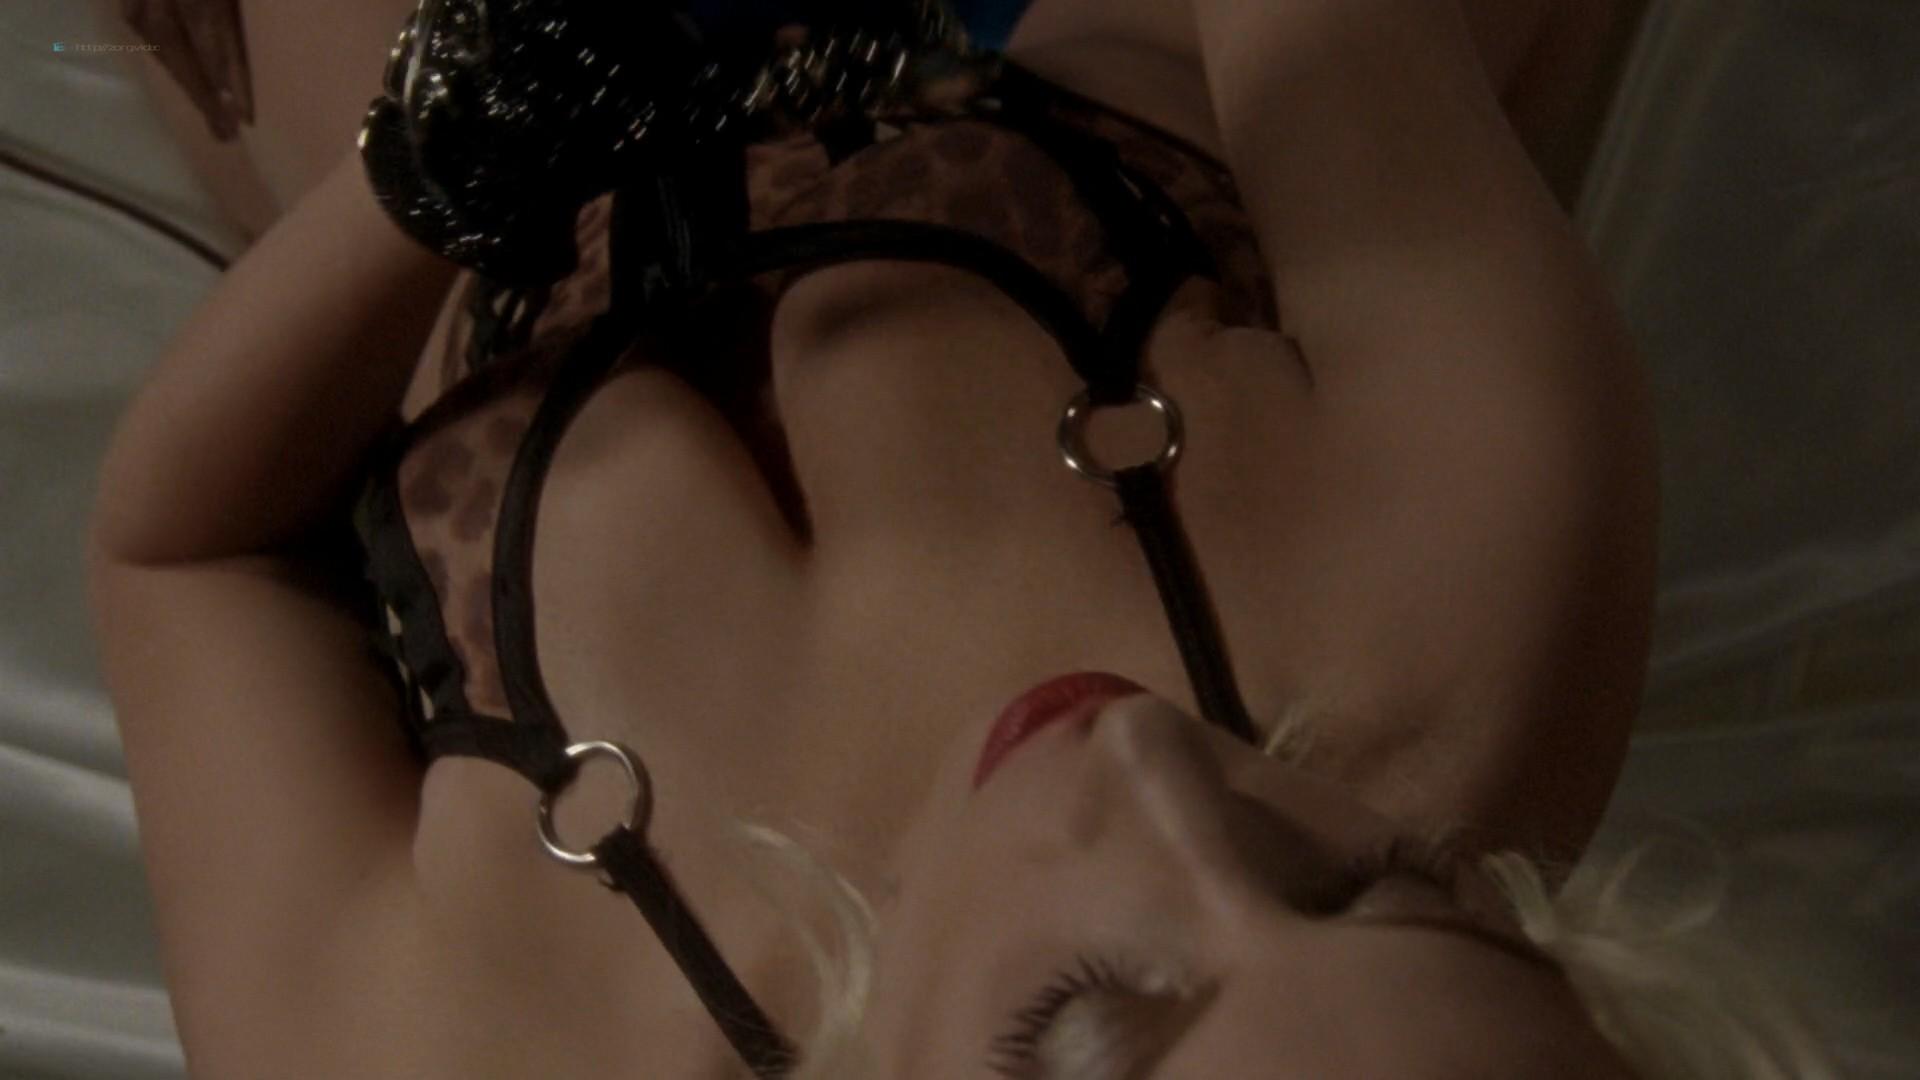 Lady Gaga and Angela Bassett hot lesbian sex - American Horror Story (2015) s5e3 HD 1080p (7)